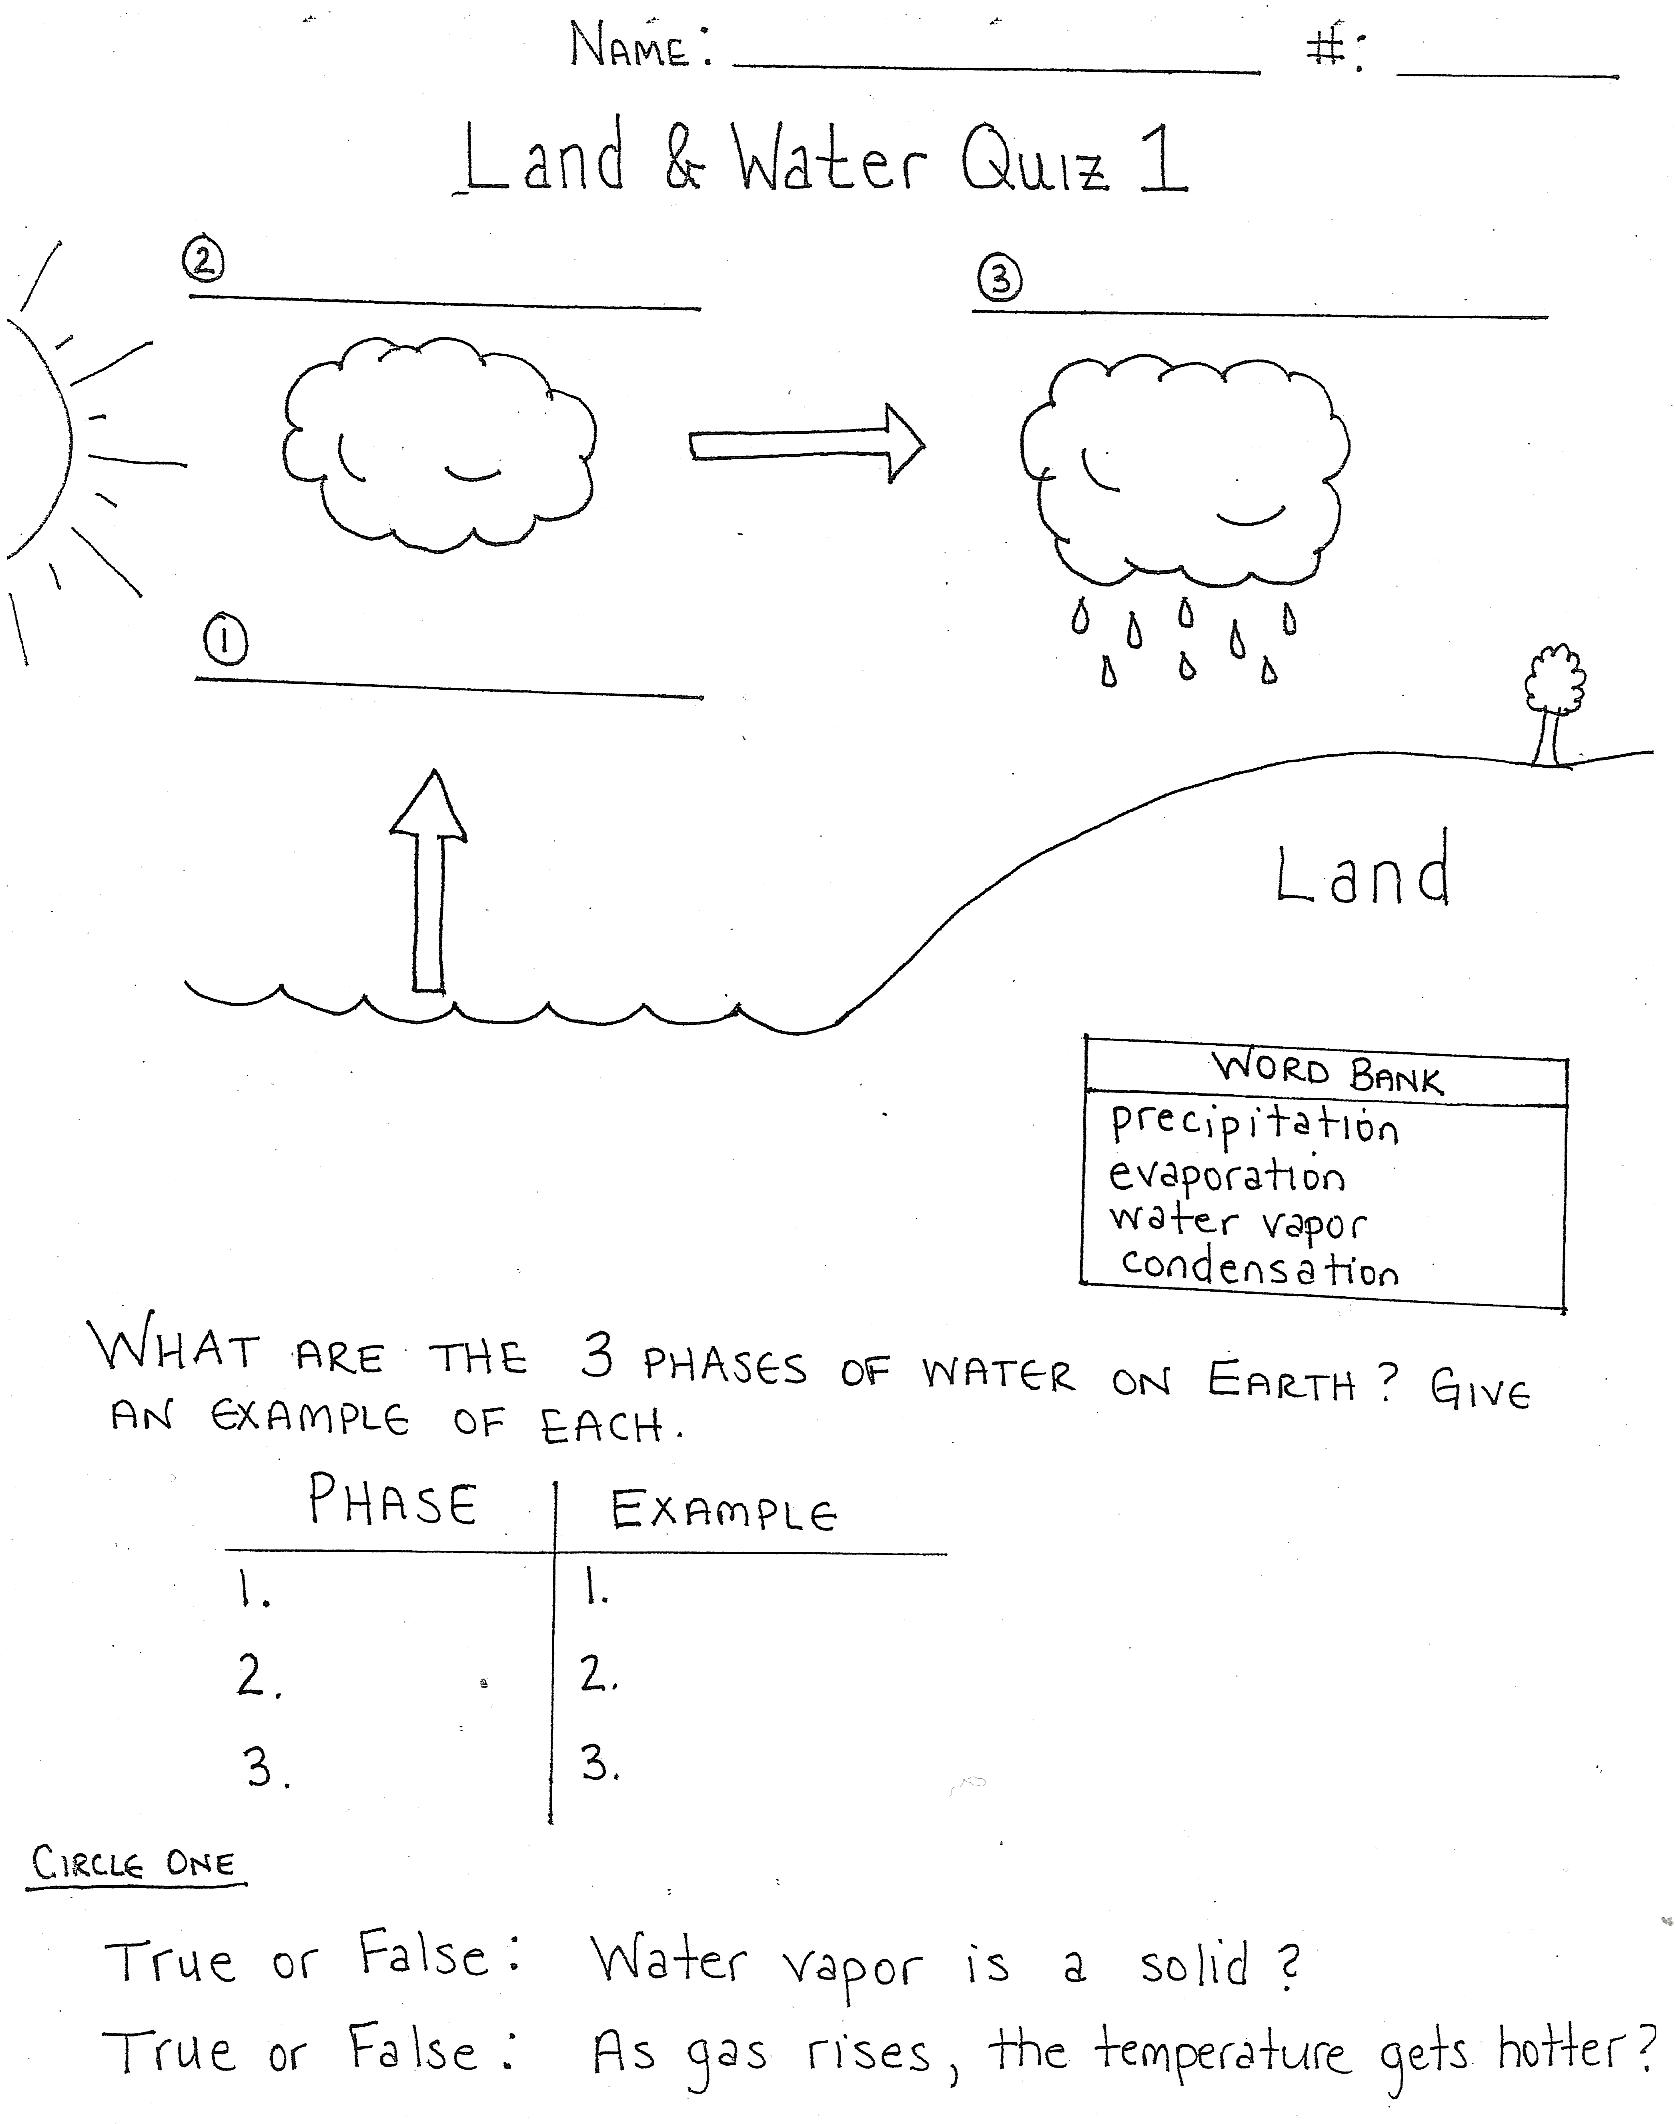 Evaporation Condensation And Precipitation Worksheet